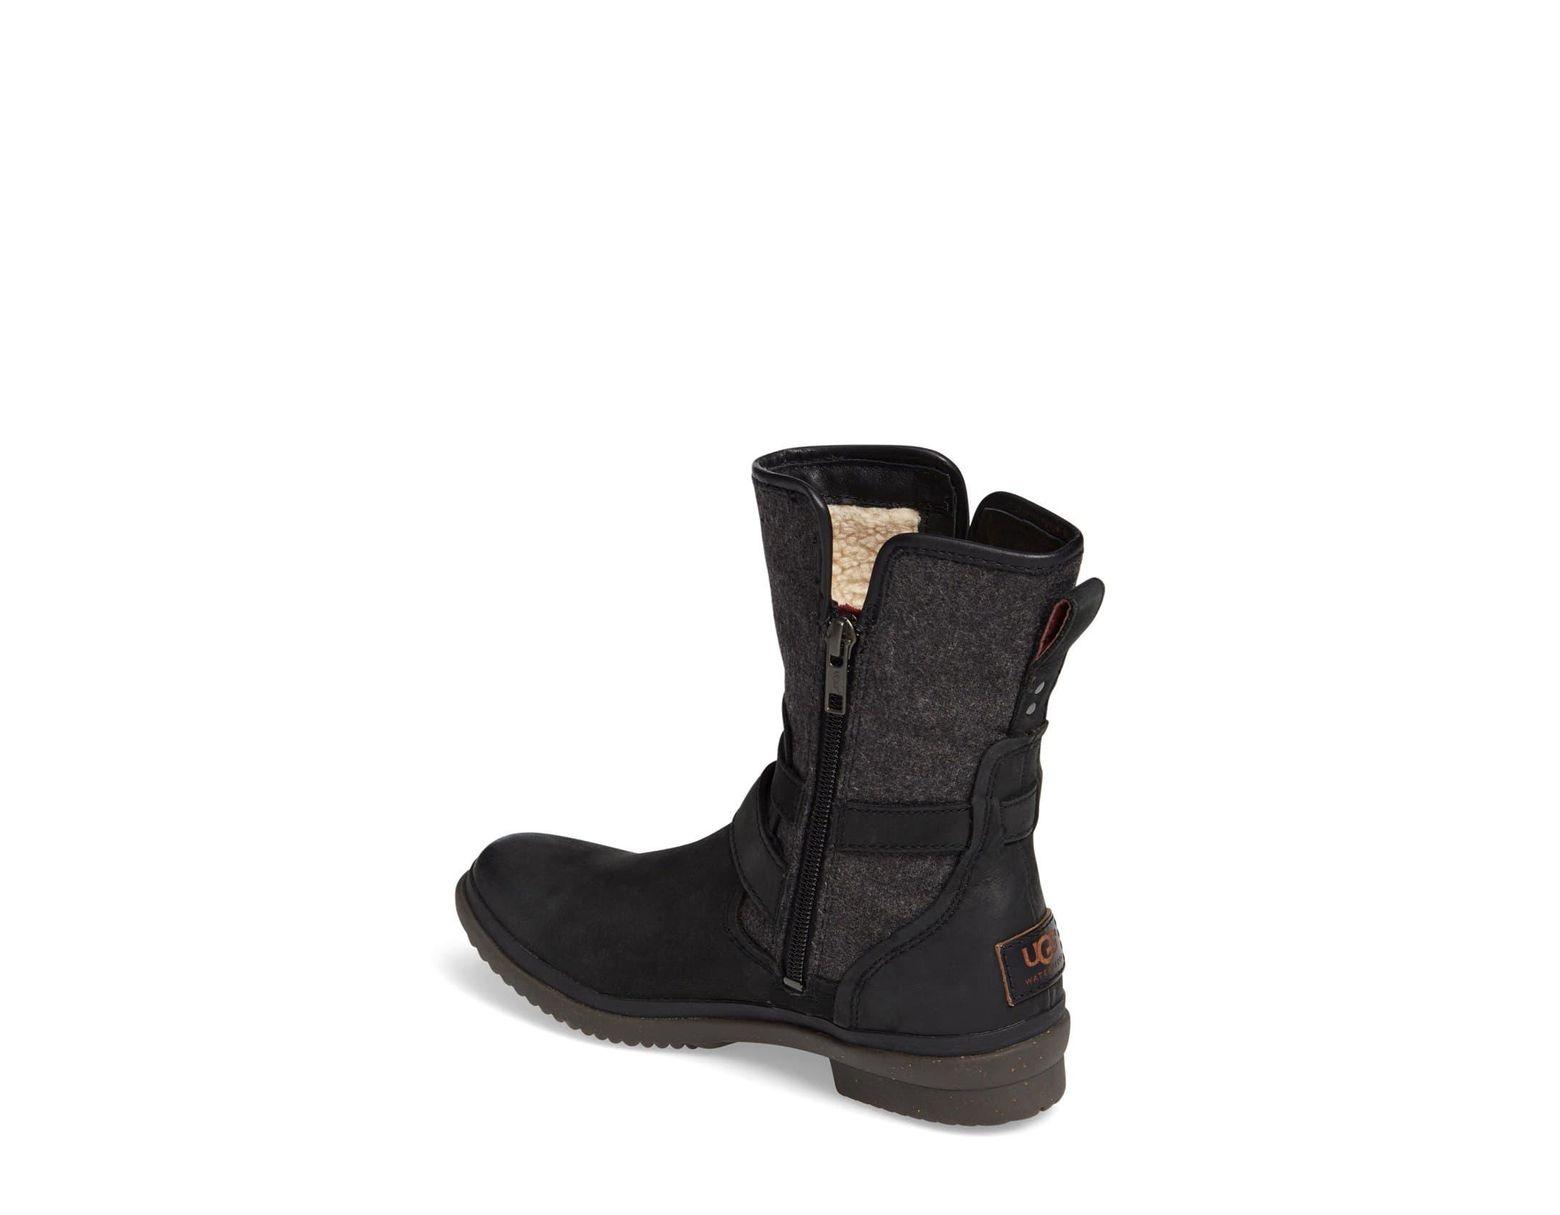 5f5b71435b1 Ugg Black Ugg Simmens Waterproof Leather Boot